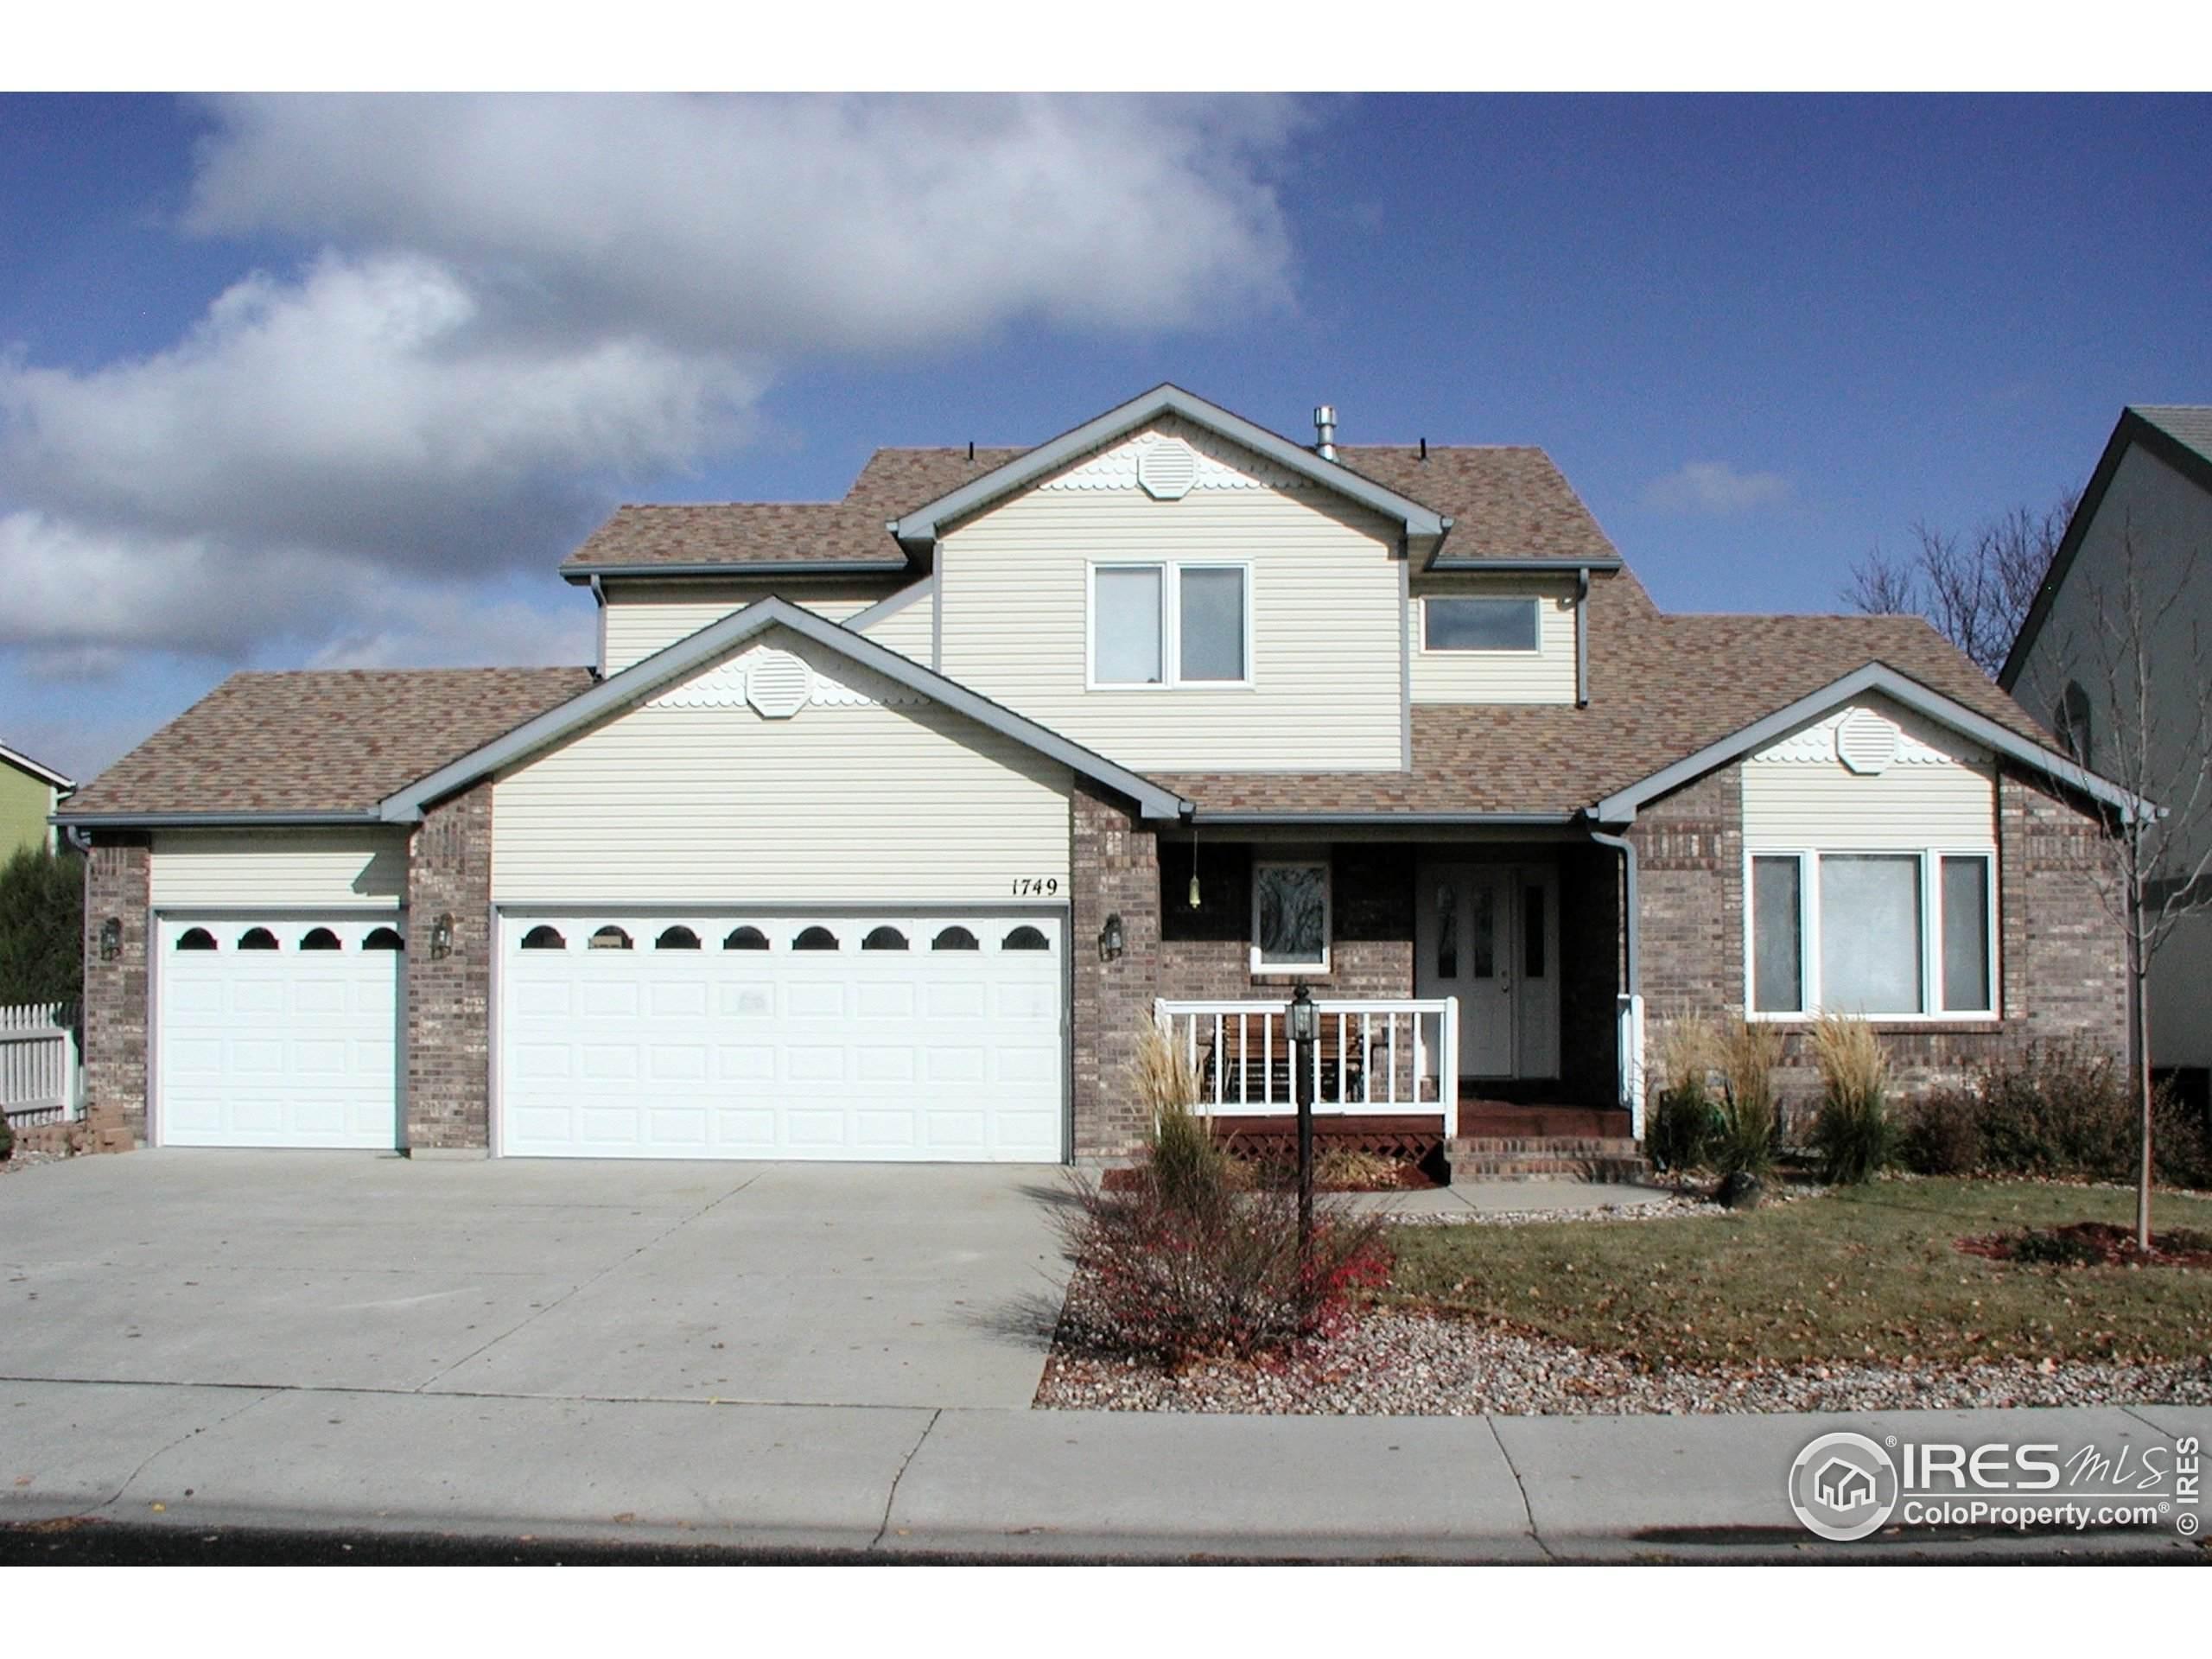 2771 Breckenridge Pl, Loveland, CO 80538 (MLS #942925) :: 8z Real Estate